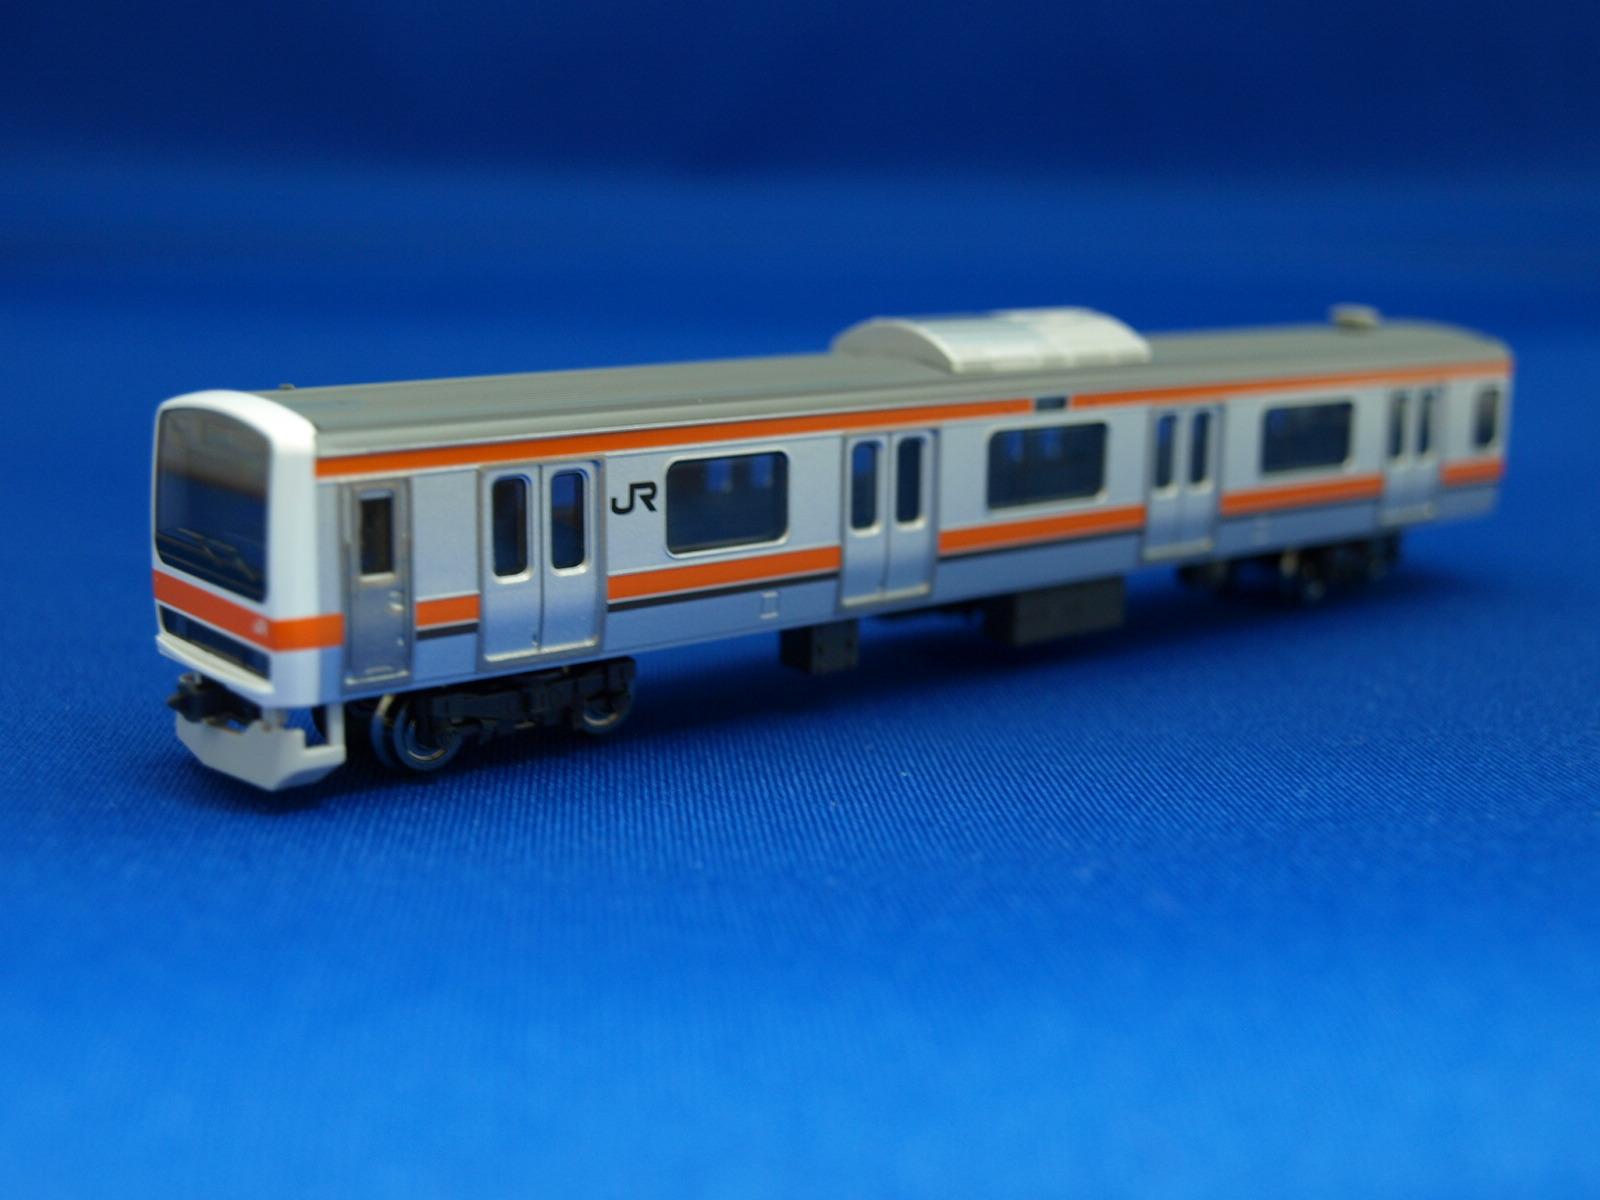 Nゲージ トミックス 98664 JR 209-500系通勤電車(武蔵野線・更新車)8両セット